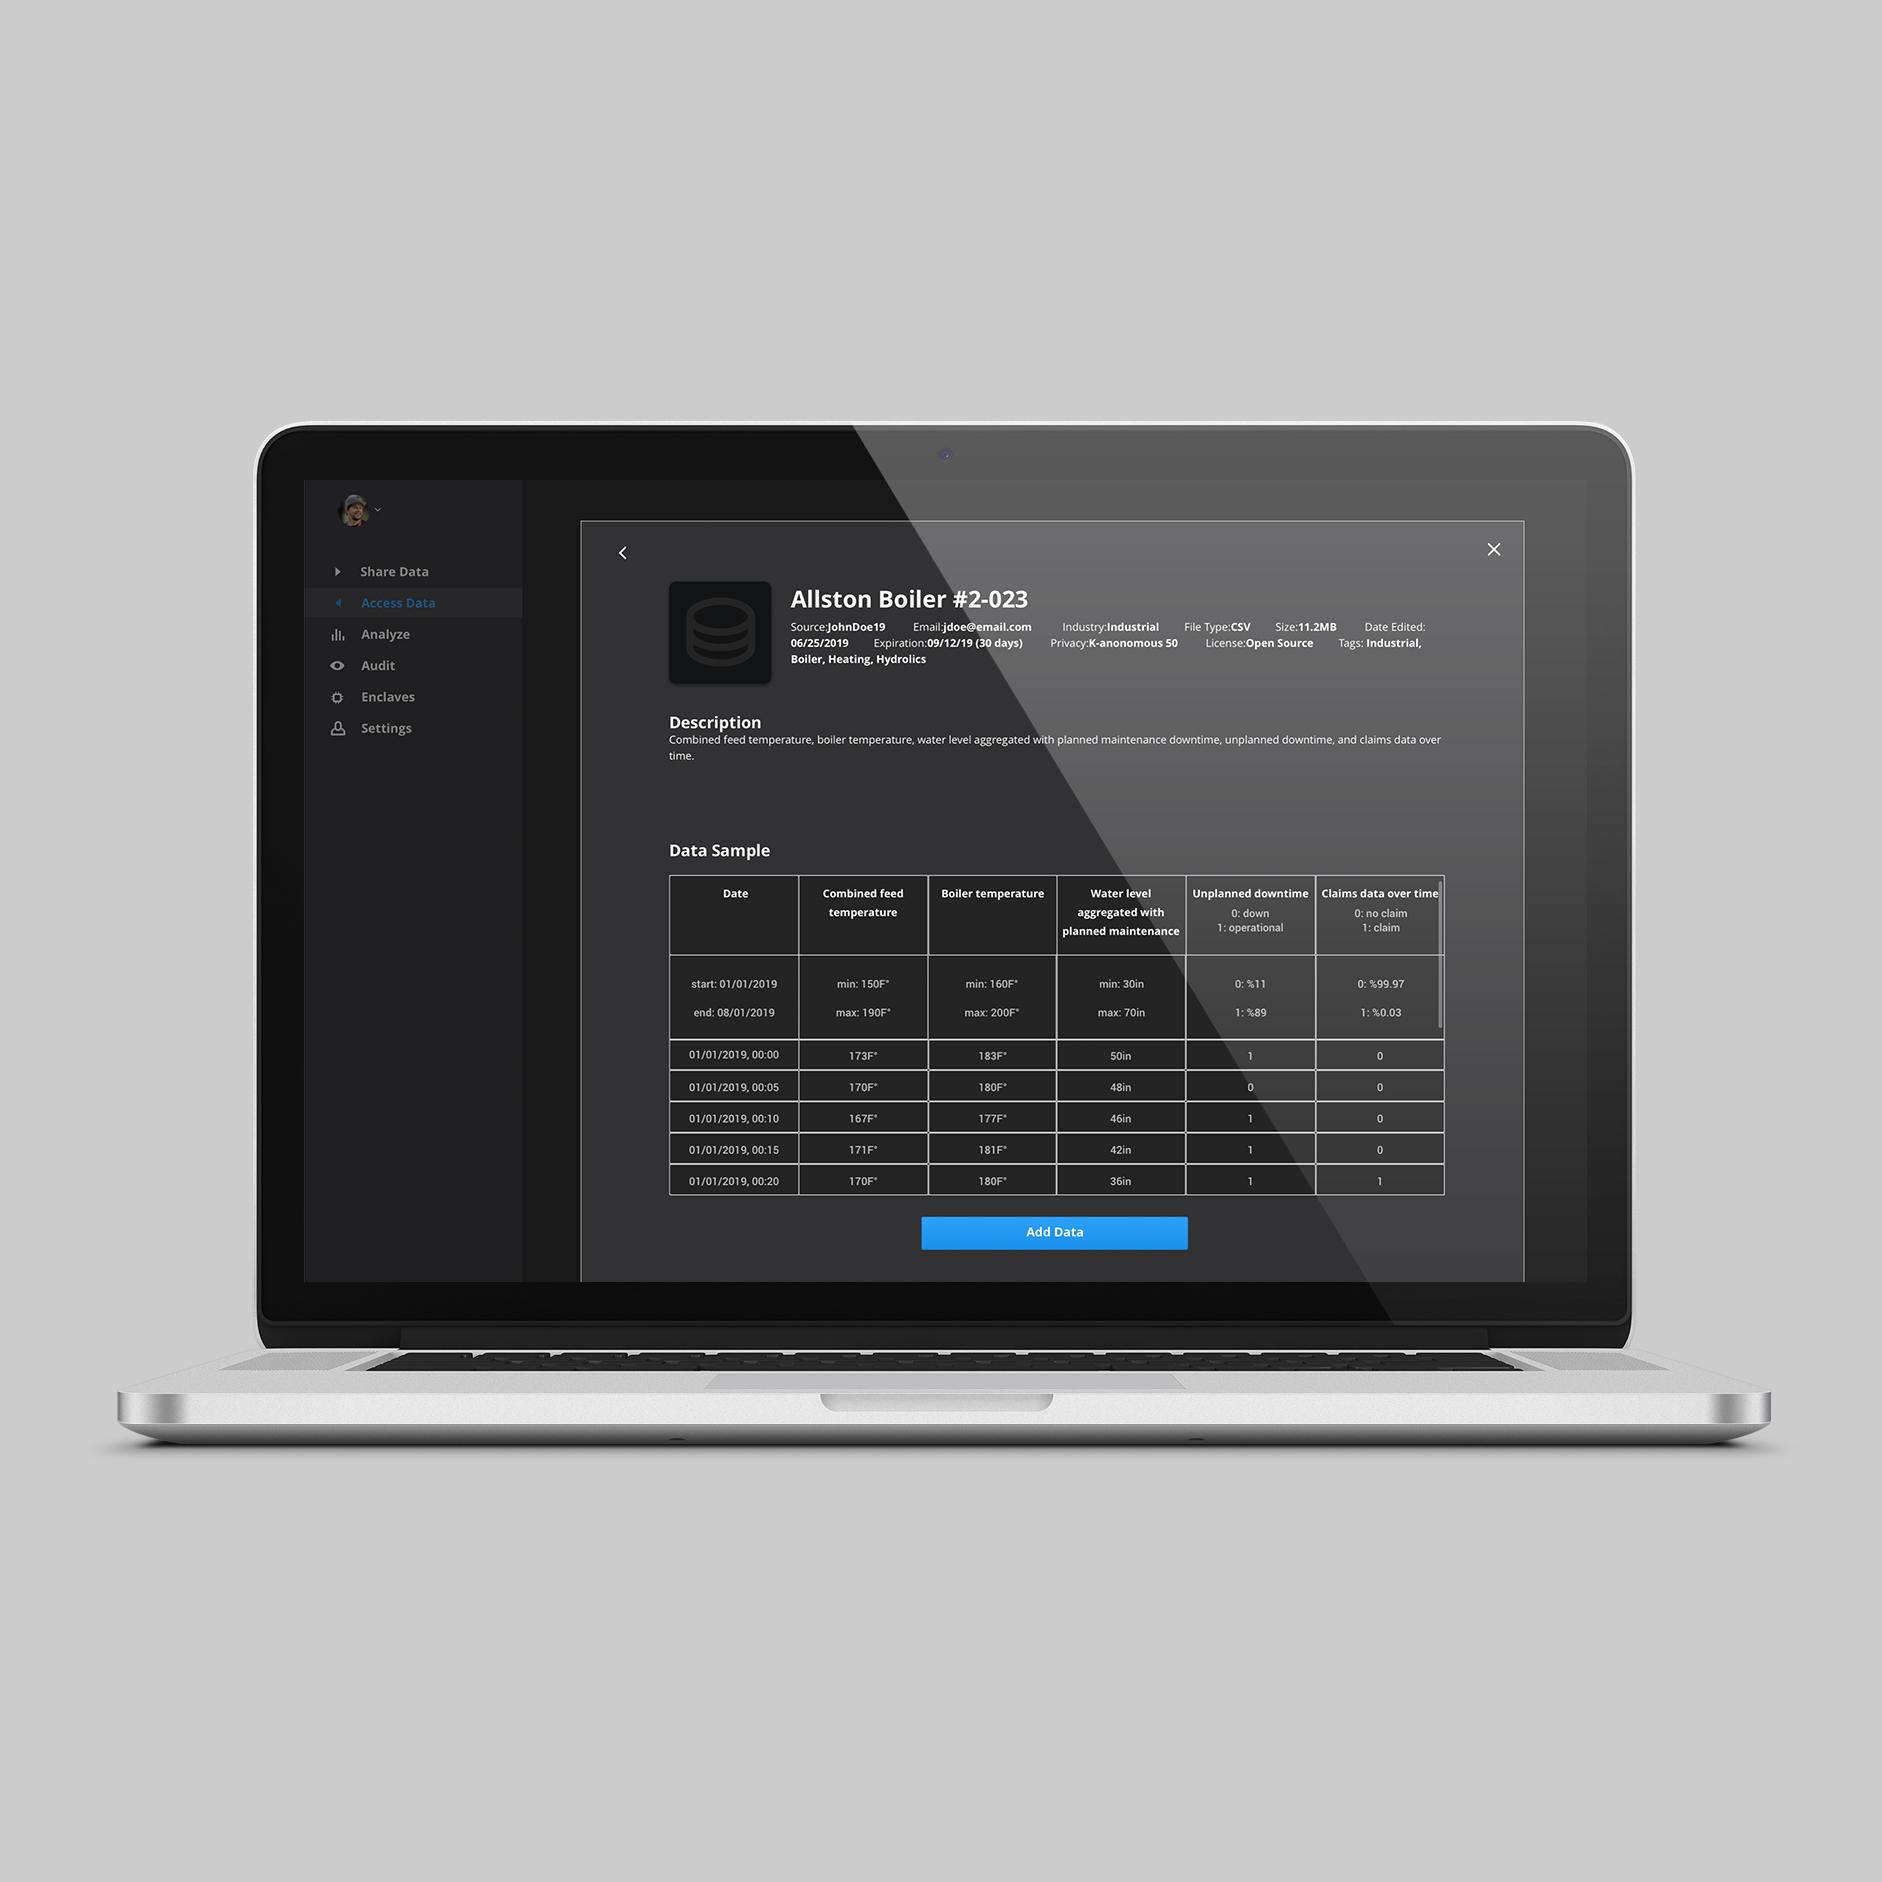 SAIL - Design Research, UI/UX, Marketing, Strategy